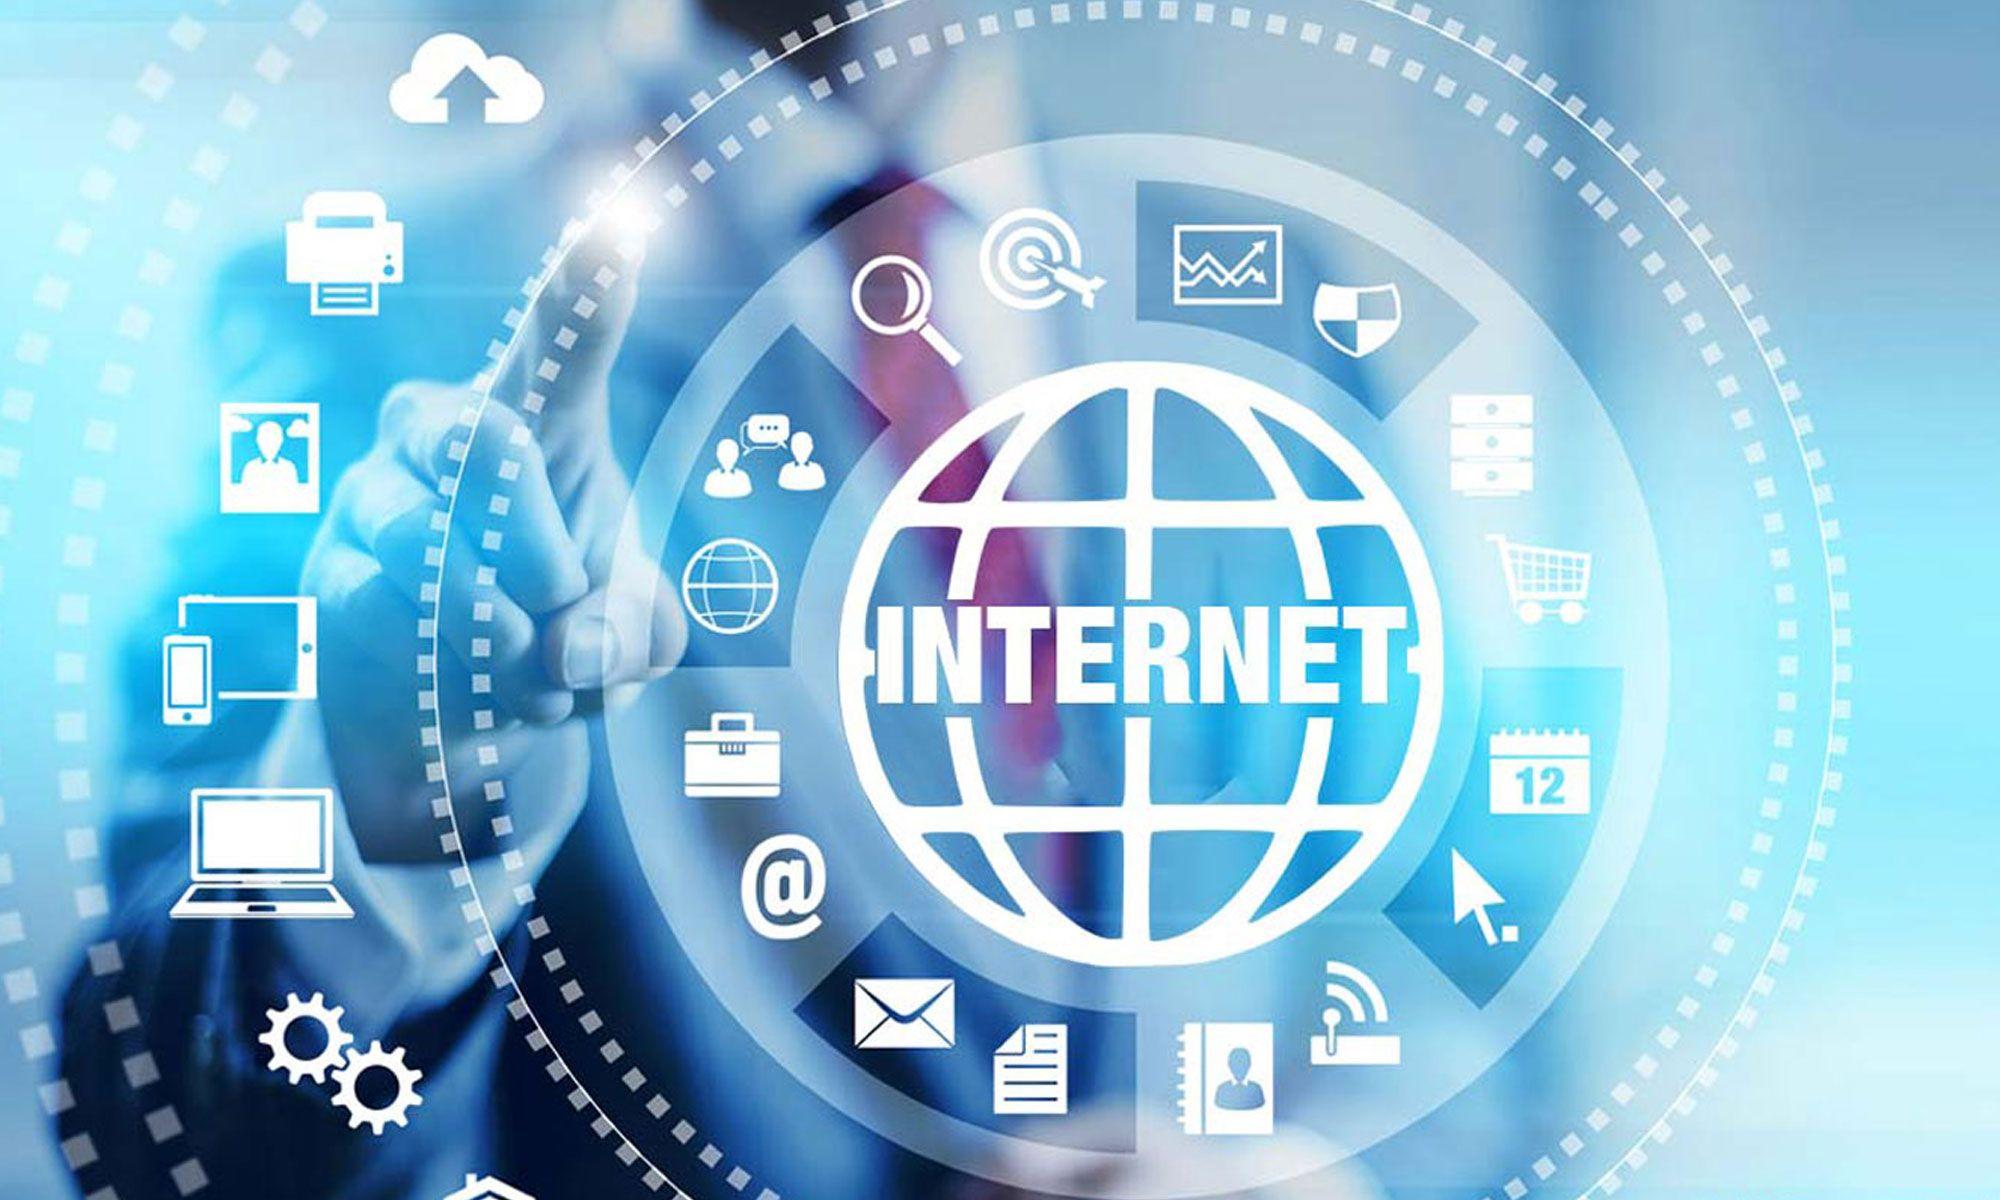 Broadband NBN program by the